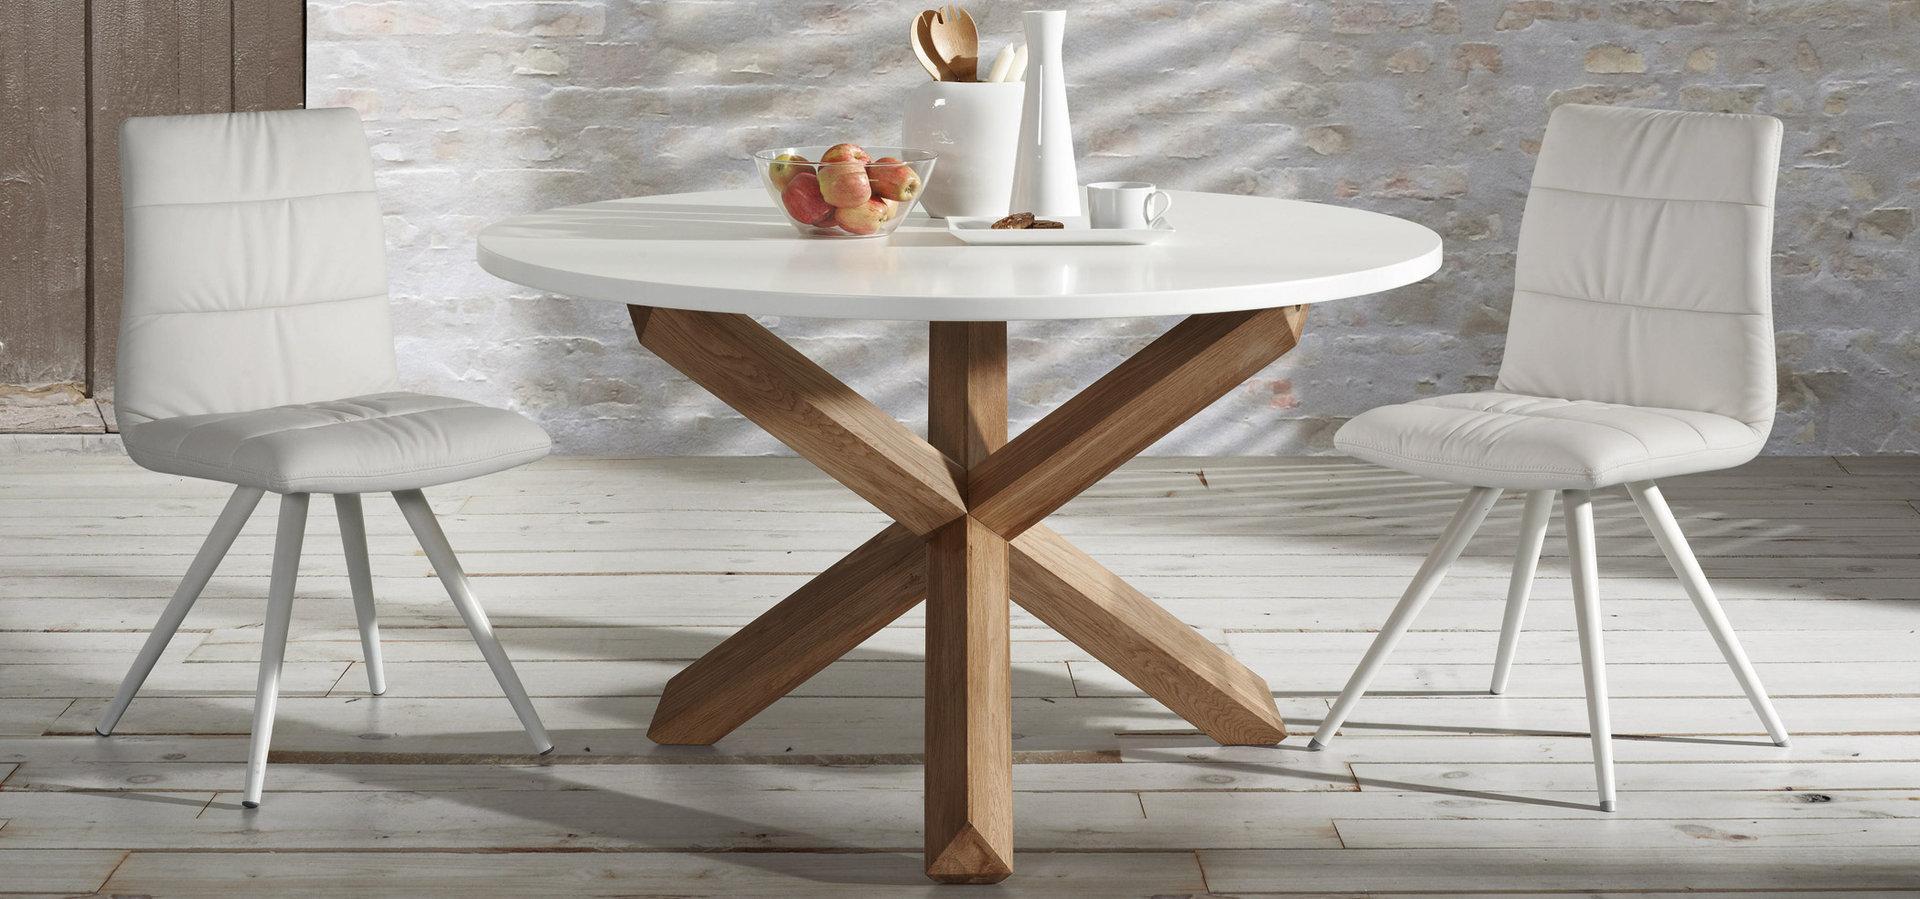 8 mesas redondas - Mesas comedor redonda ...